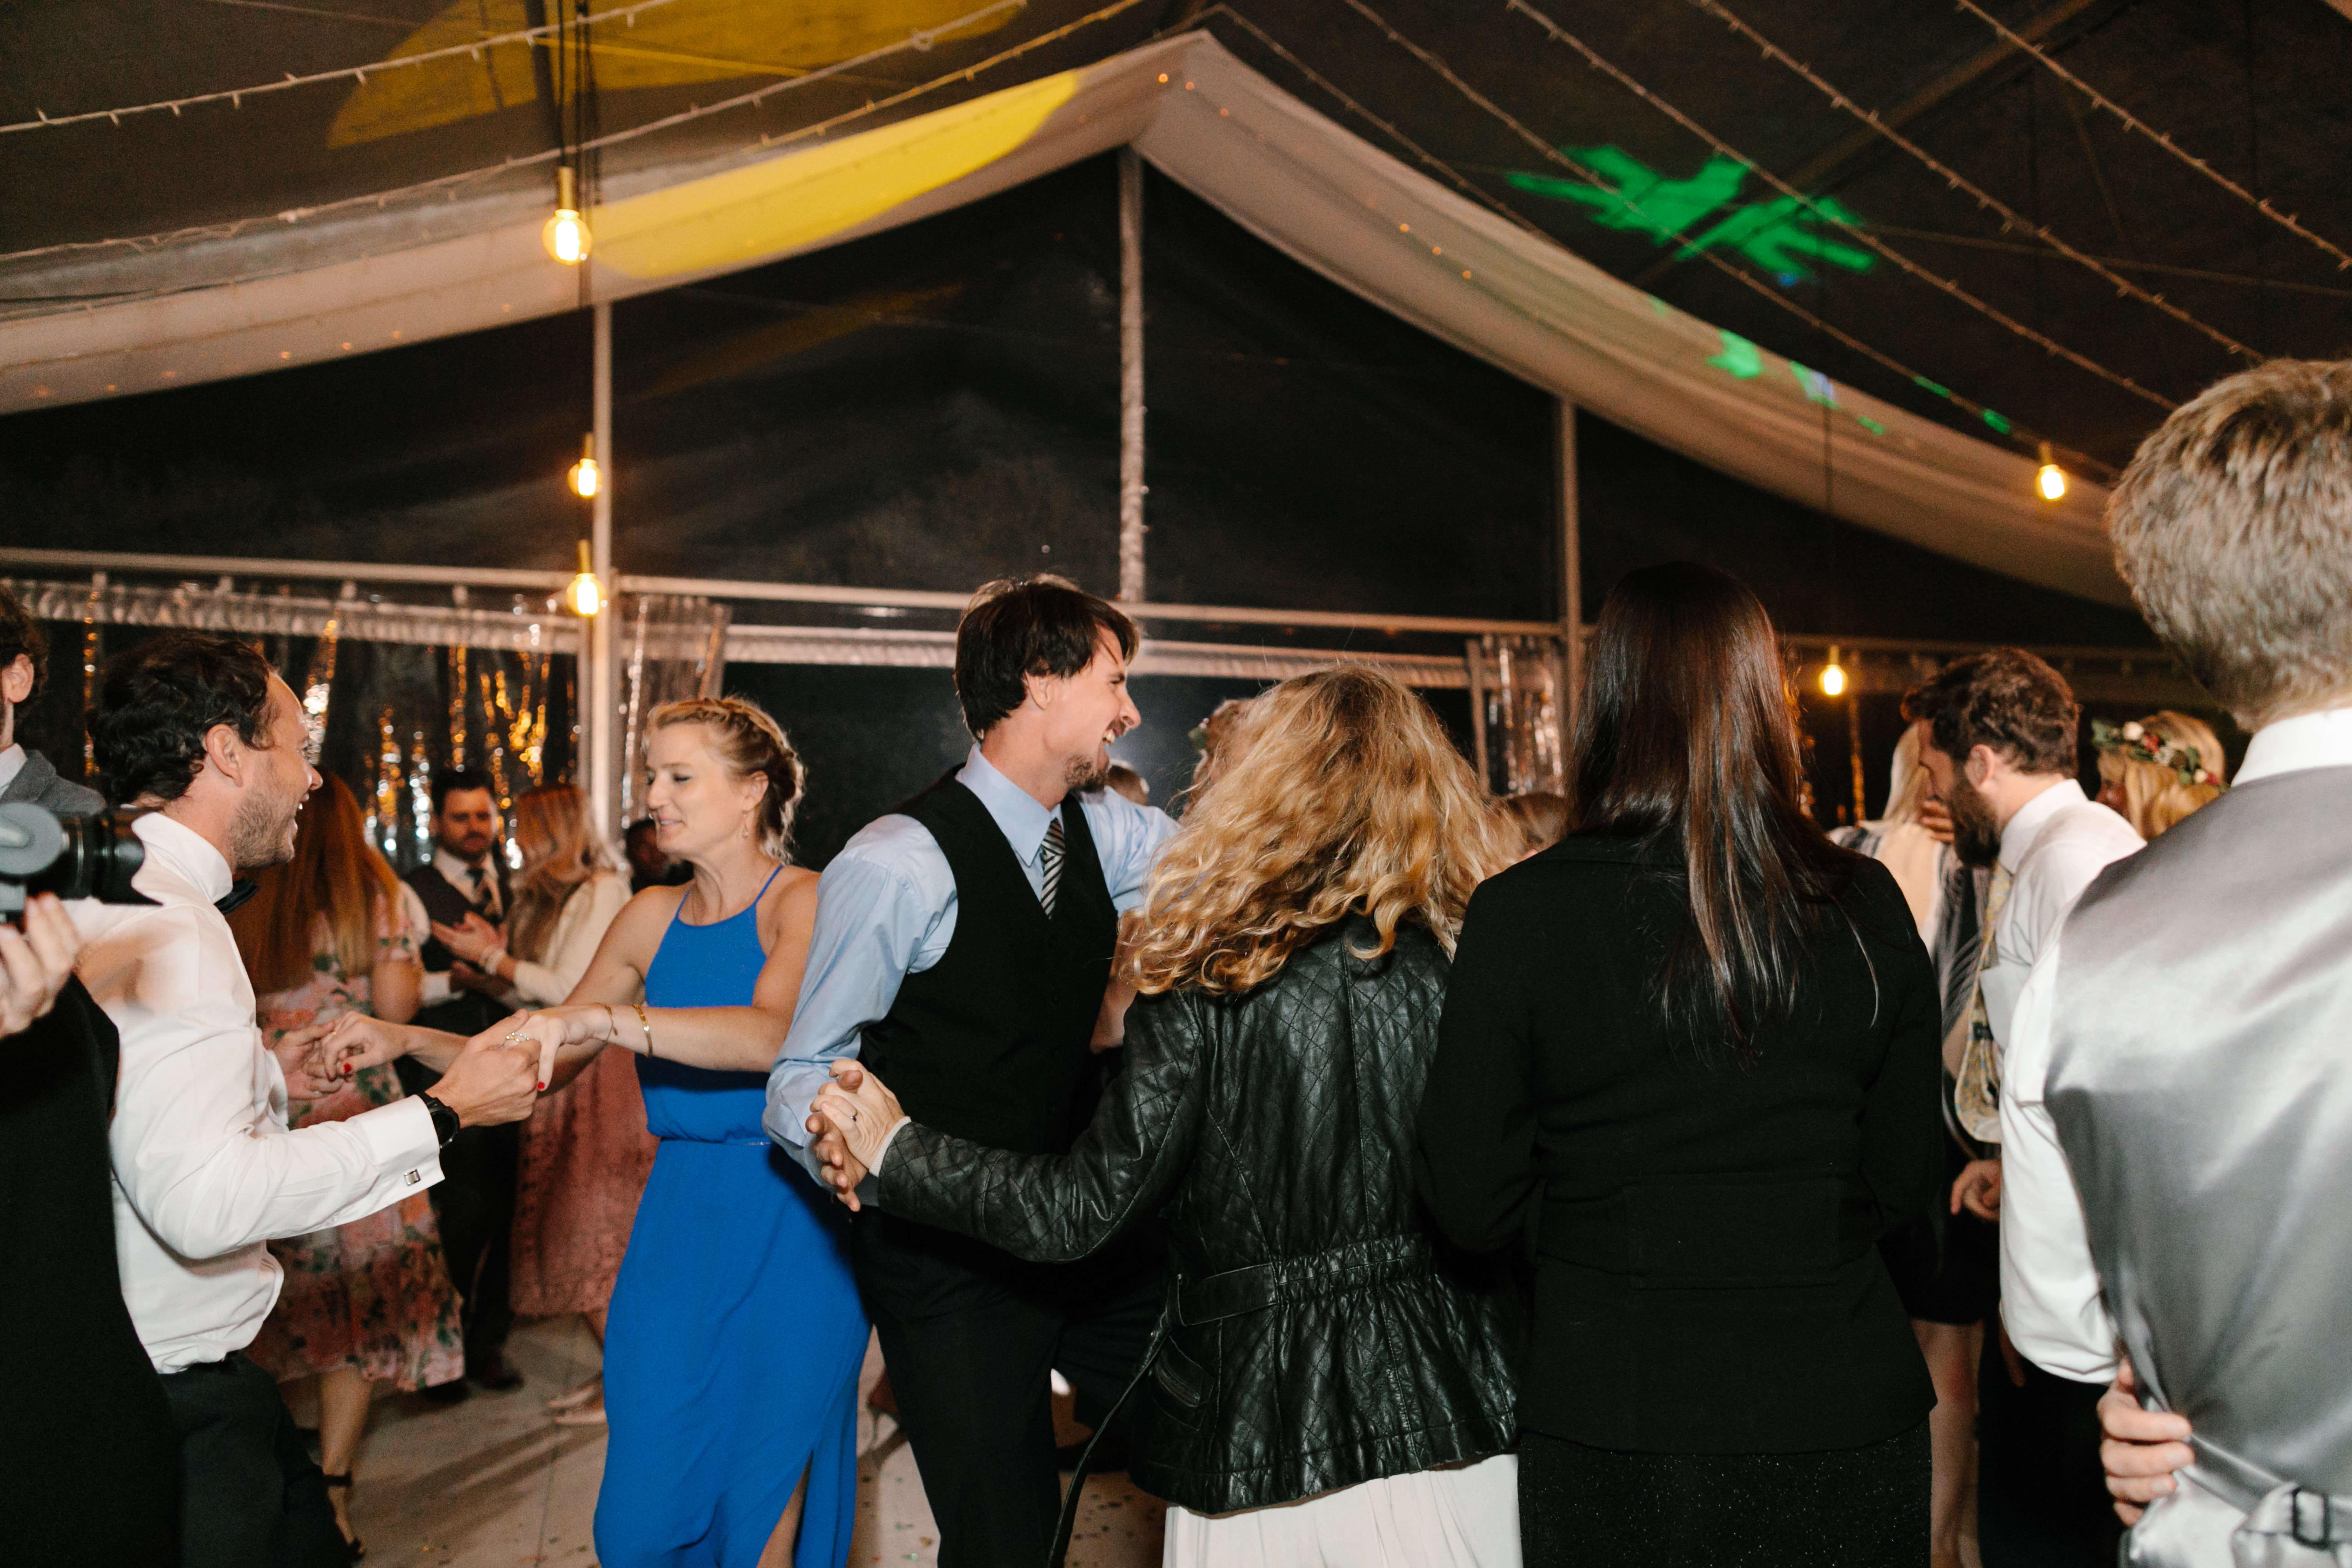 Many people enjoying great music at a Stellenbosch wedding.